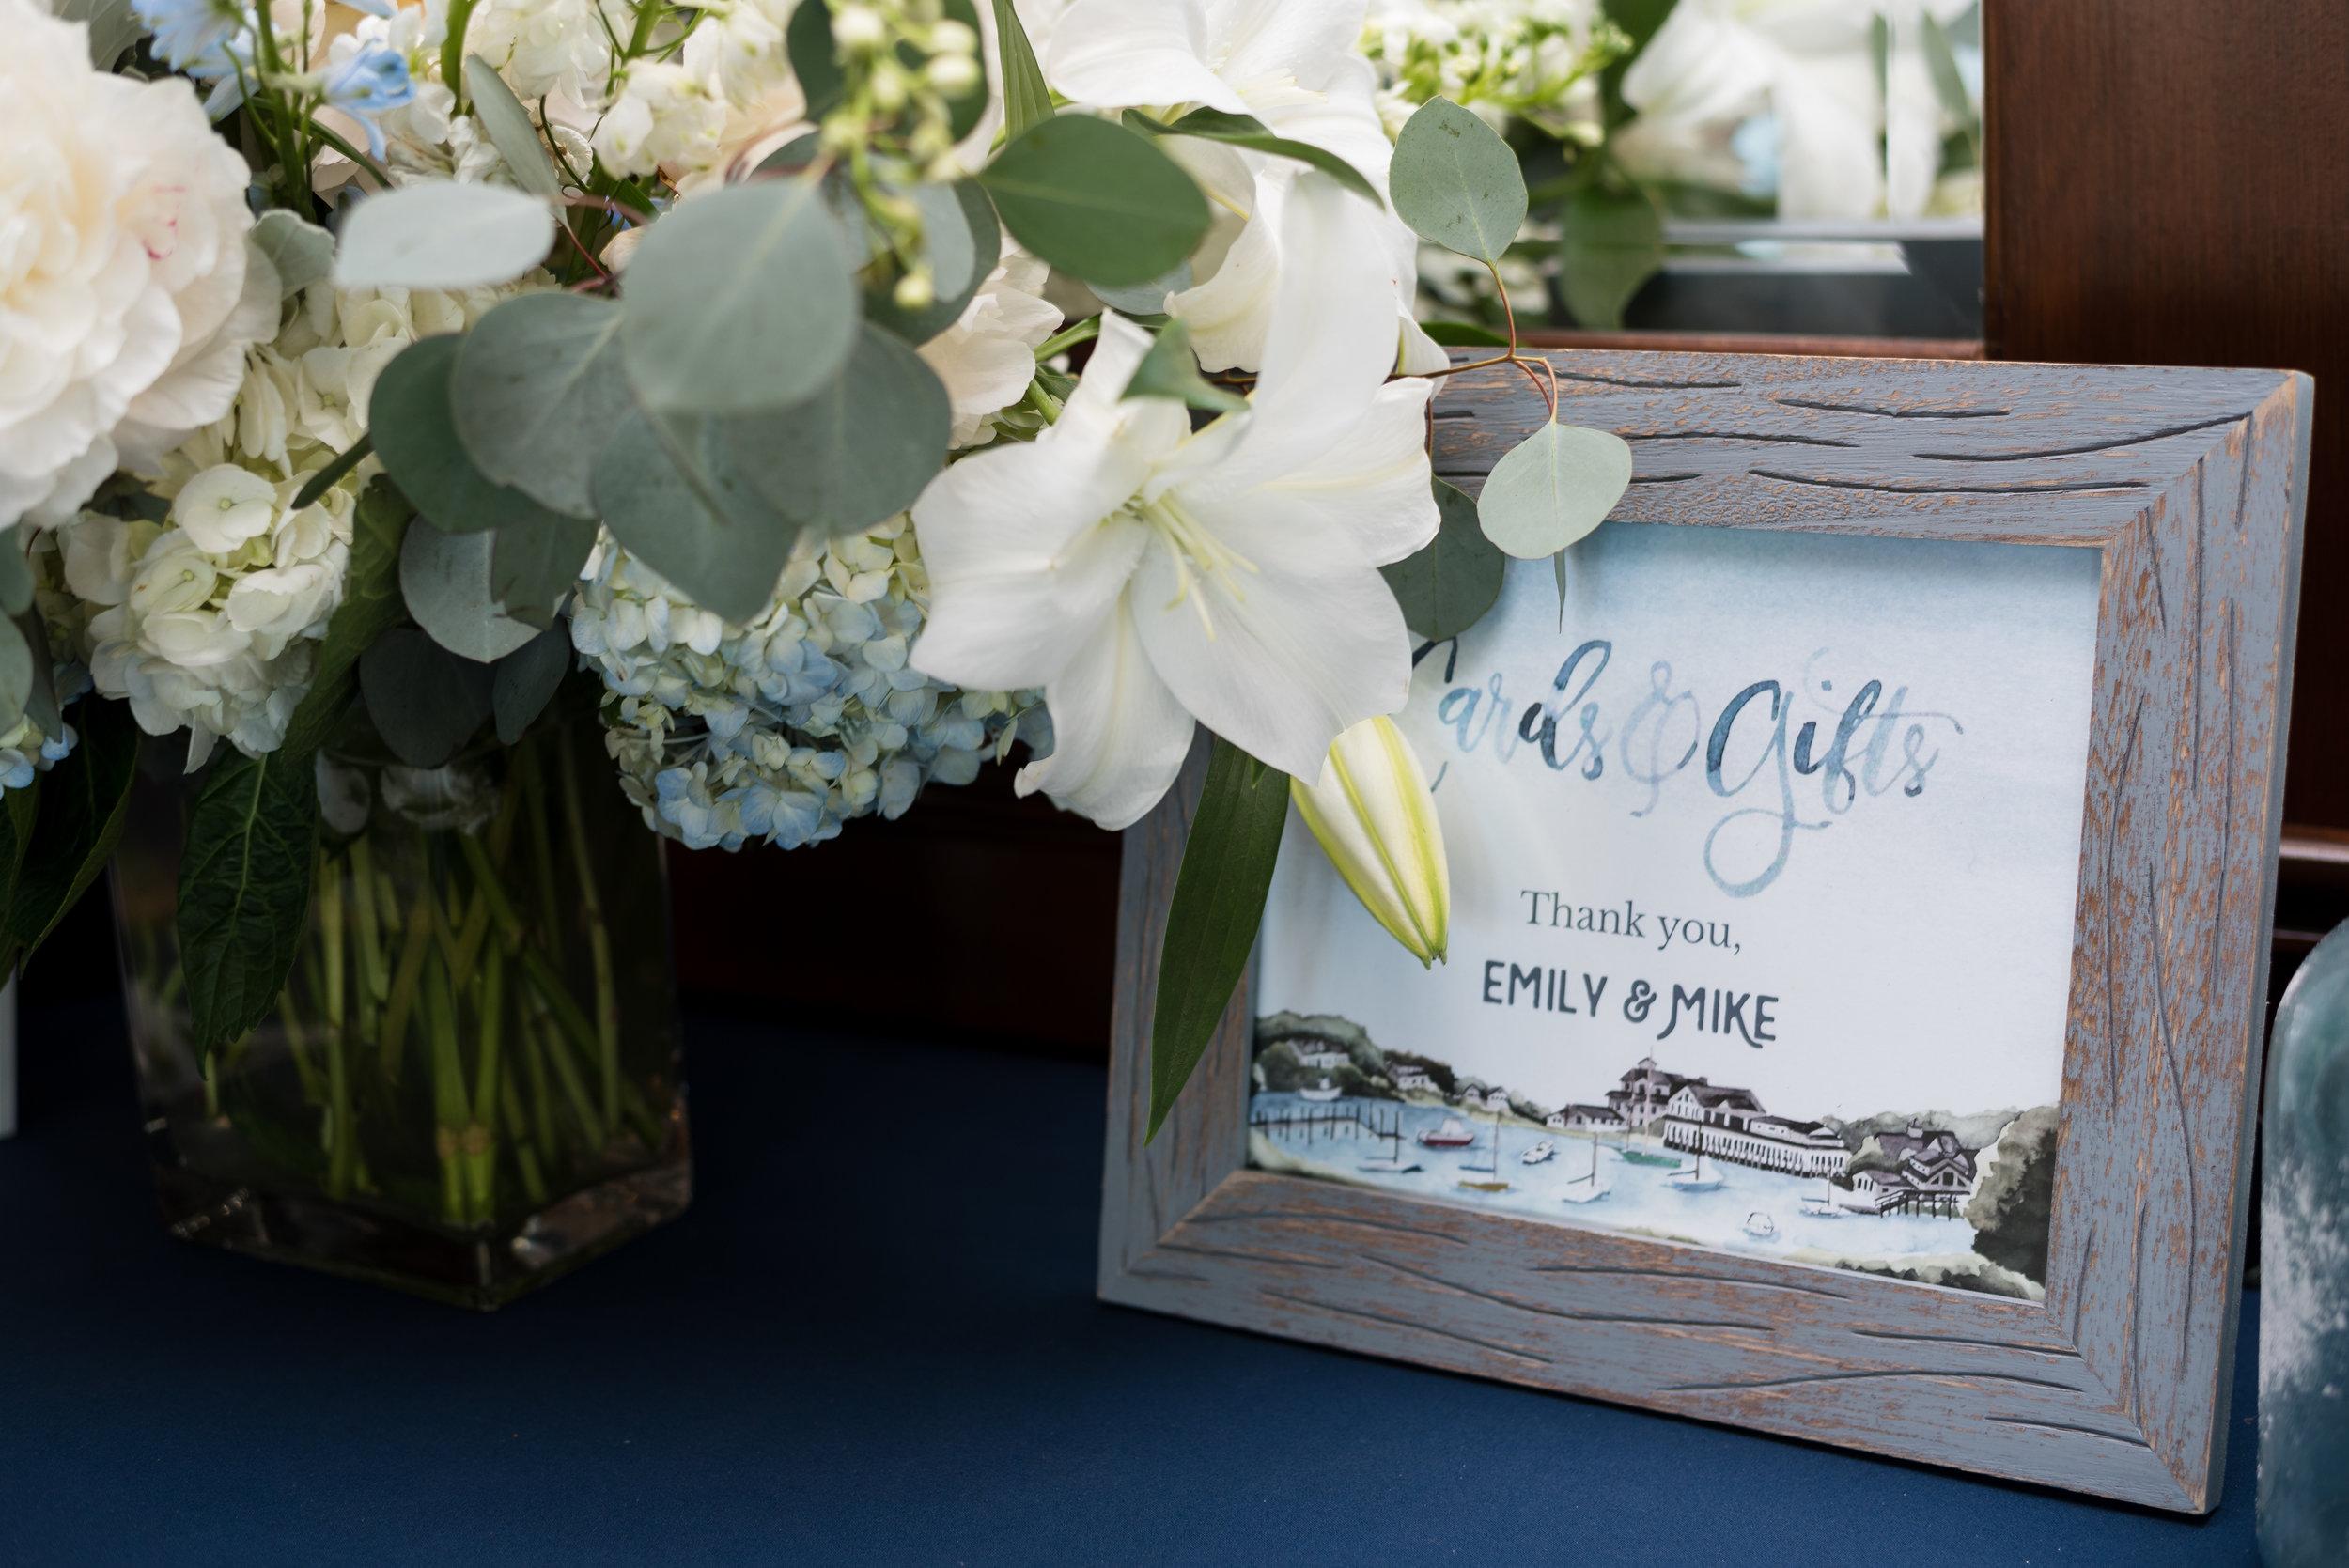 Emily_Mike_Wychmere_Beach_Club_Wedding_Cape_Cod_Harwich_Port_Massachusetts_Sarah_Murray_Photography_Photo_0675.jpg